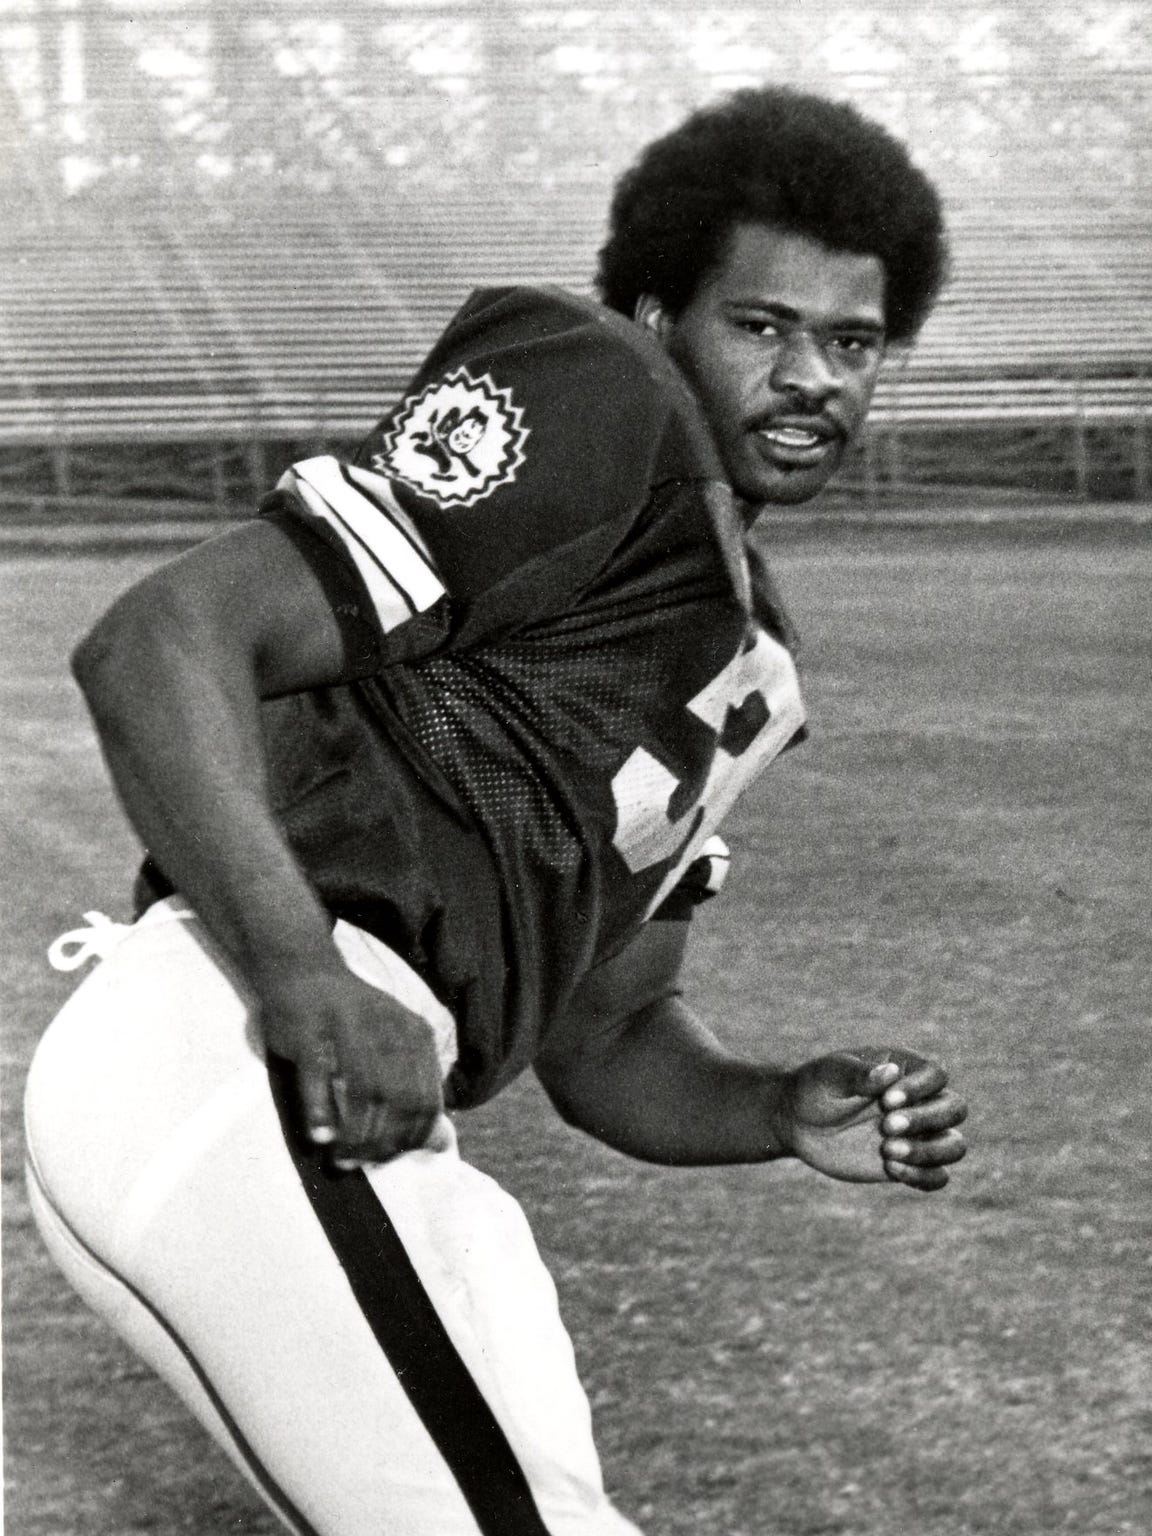 Former ASU football player Larry Gordon died at 29